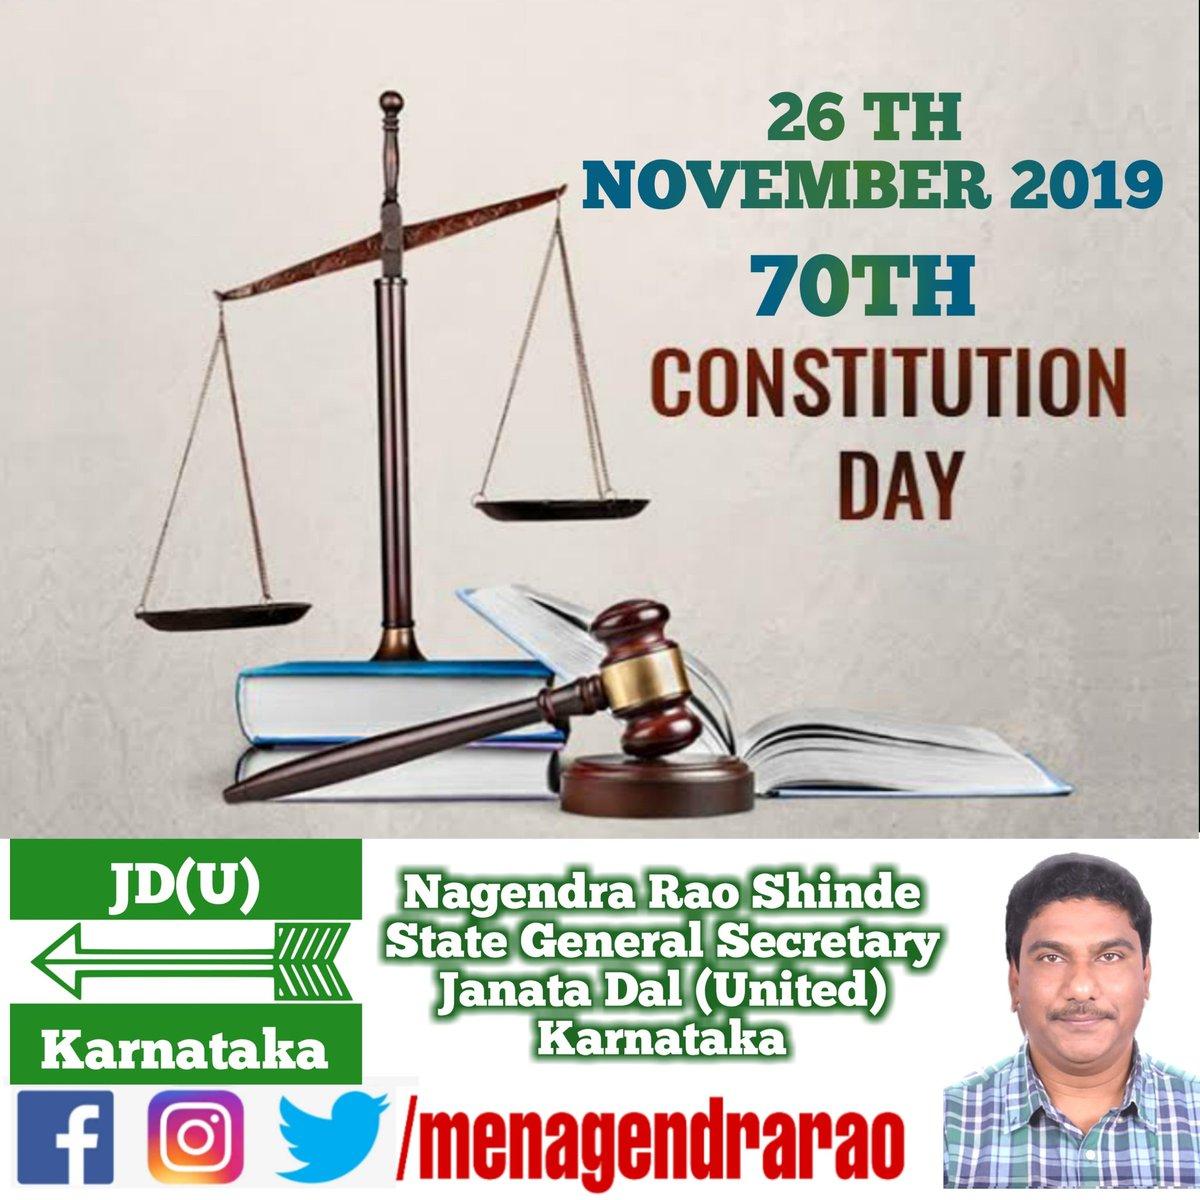 #ConstitutionDay #JDU #Karnataka @gsecretaryjdu @NitishKumar @PrashantKishor @afaquejdu @RCP_Singh @SanjayJhaBihar @JDU_India @Jduonline @KCTyagiJDU @sanjaykumarjdu https://t.co/JikLXMWtAD